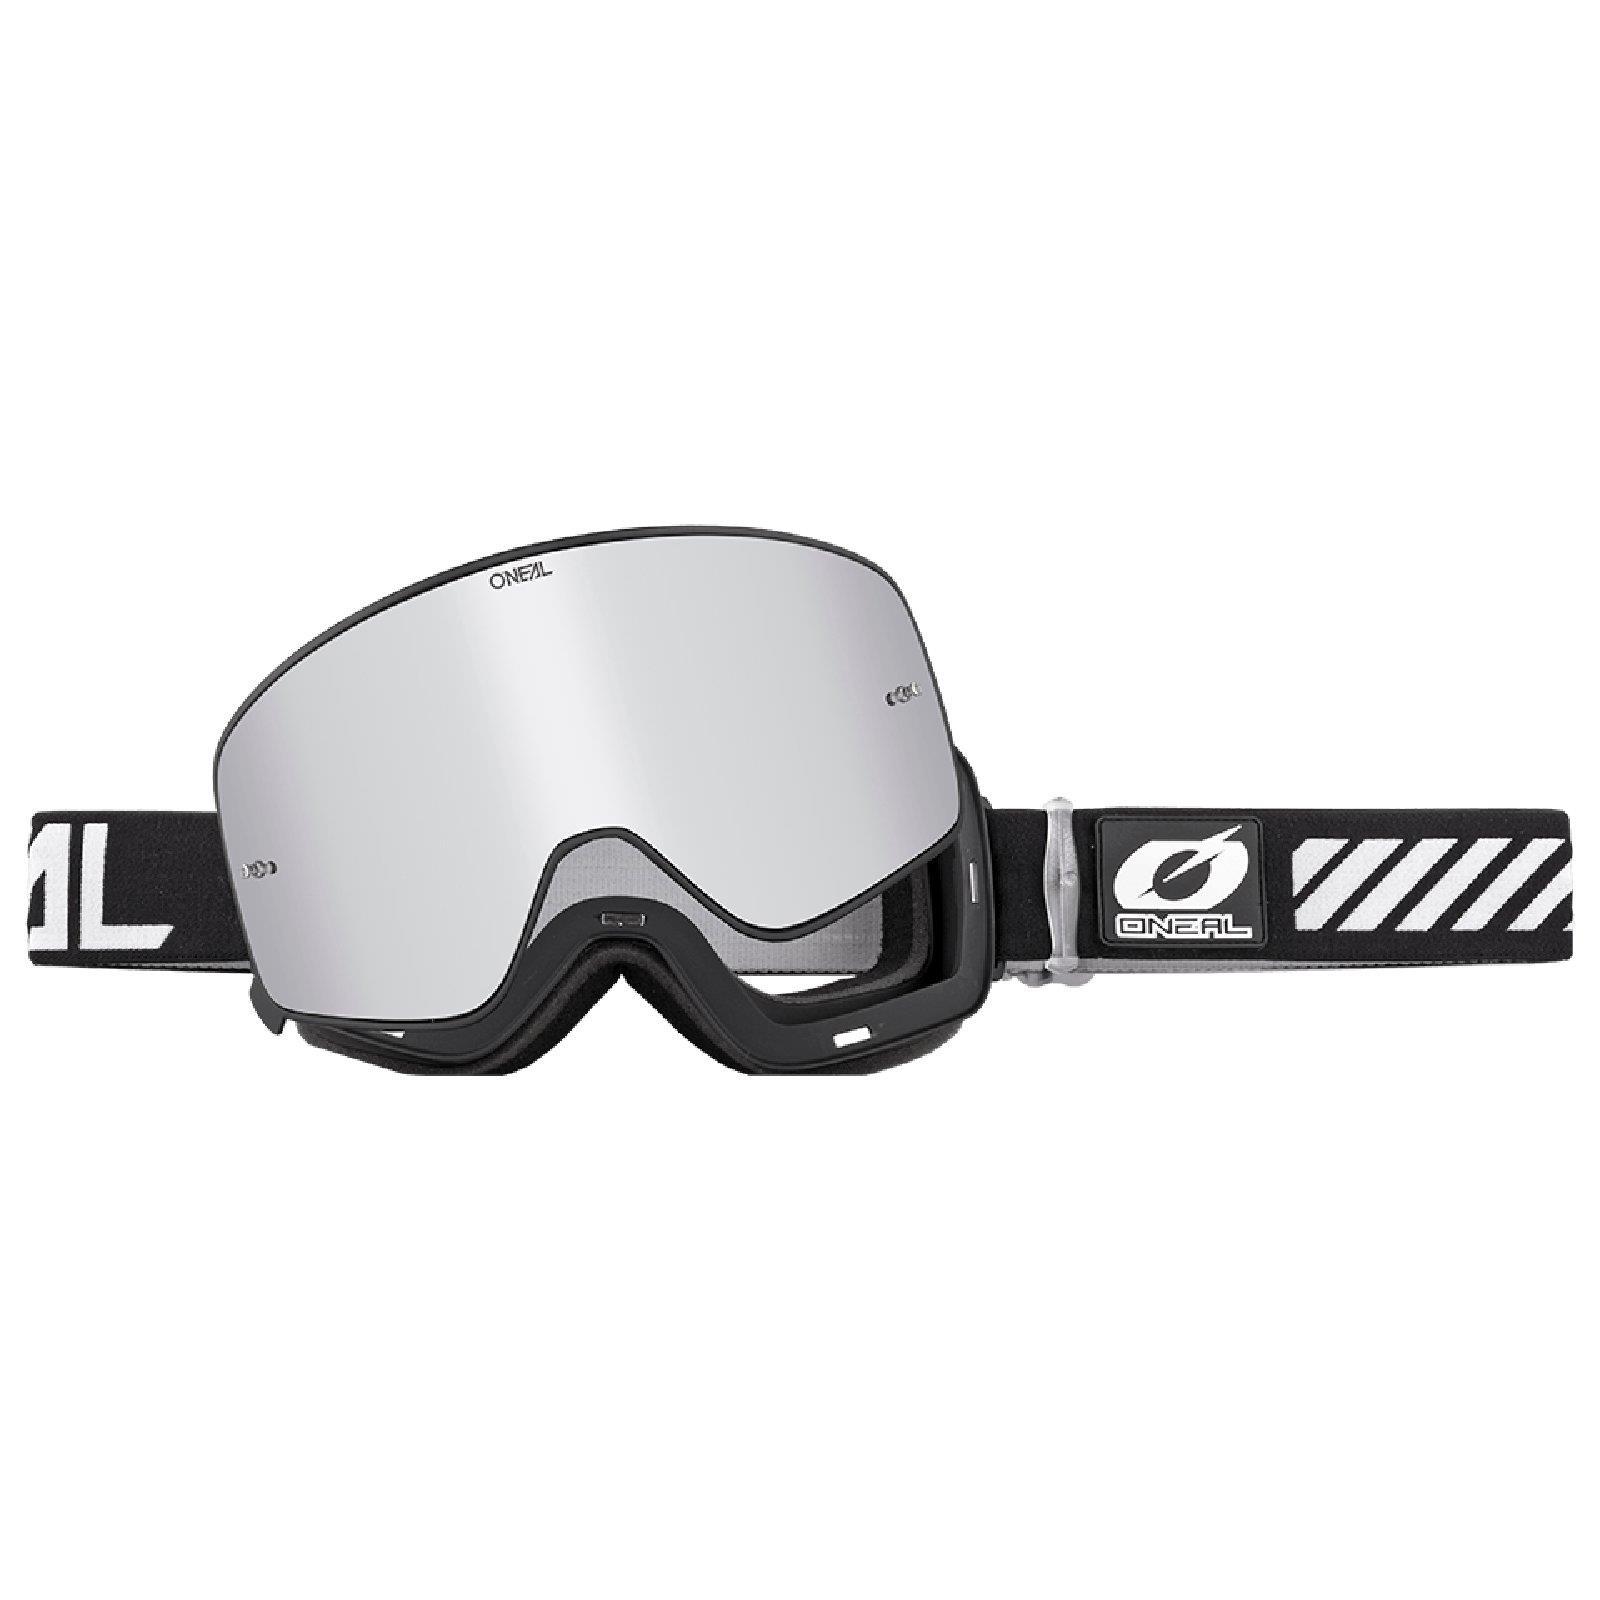 ONeal B-50 Goggle Goggle Goggle Force Moto Cross Brille Verspiegelt Downhill MX Mountainbike d0e89b